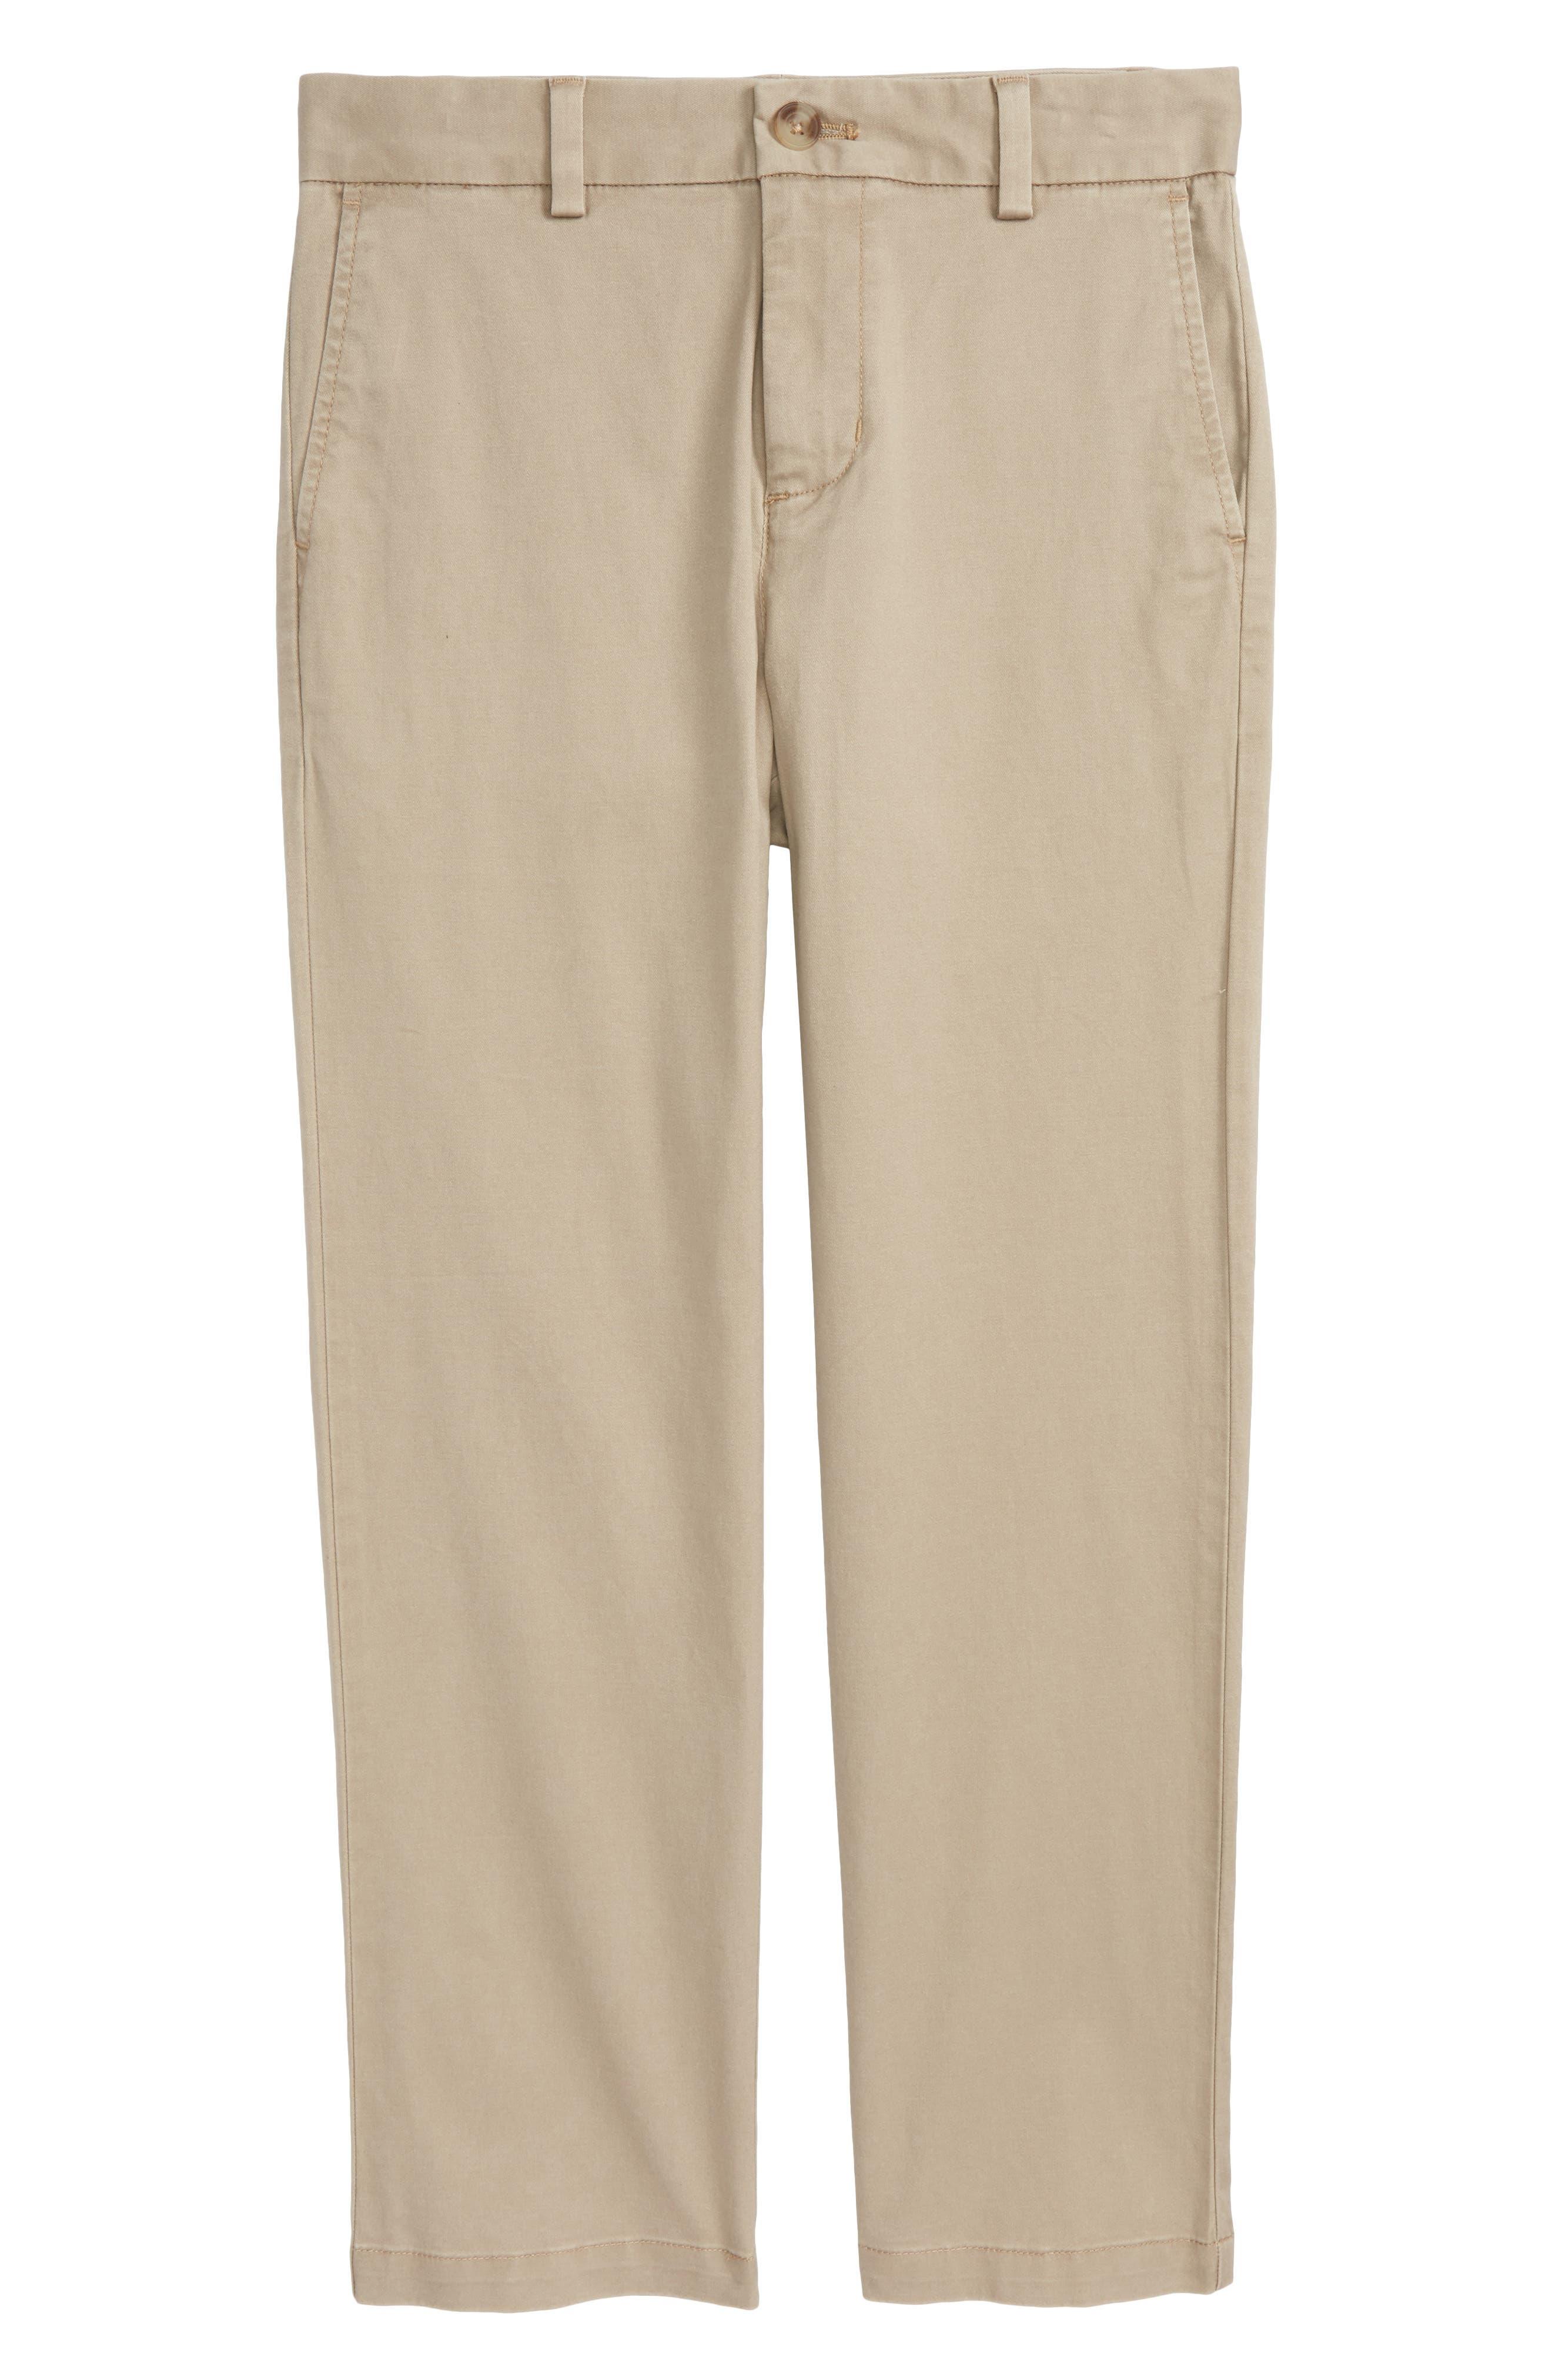 VINEYARD VINES Stretch Breaker Pants, Main, color, KHAKI